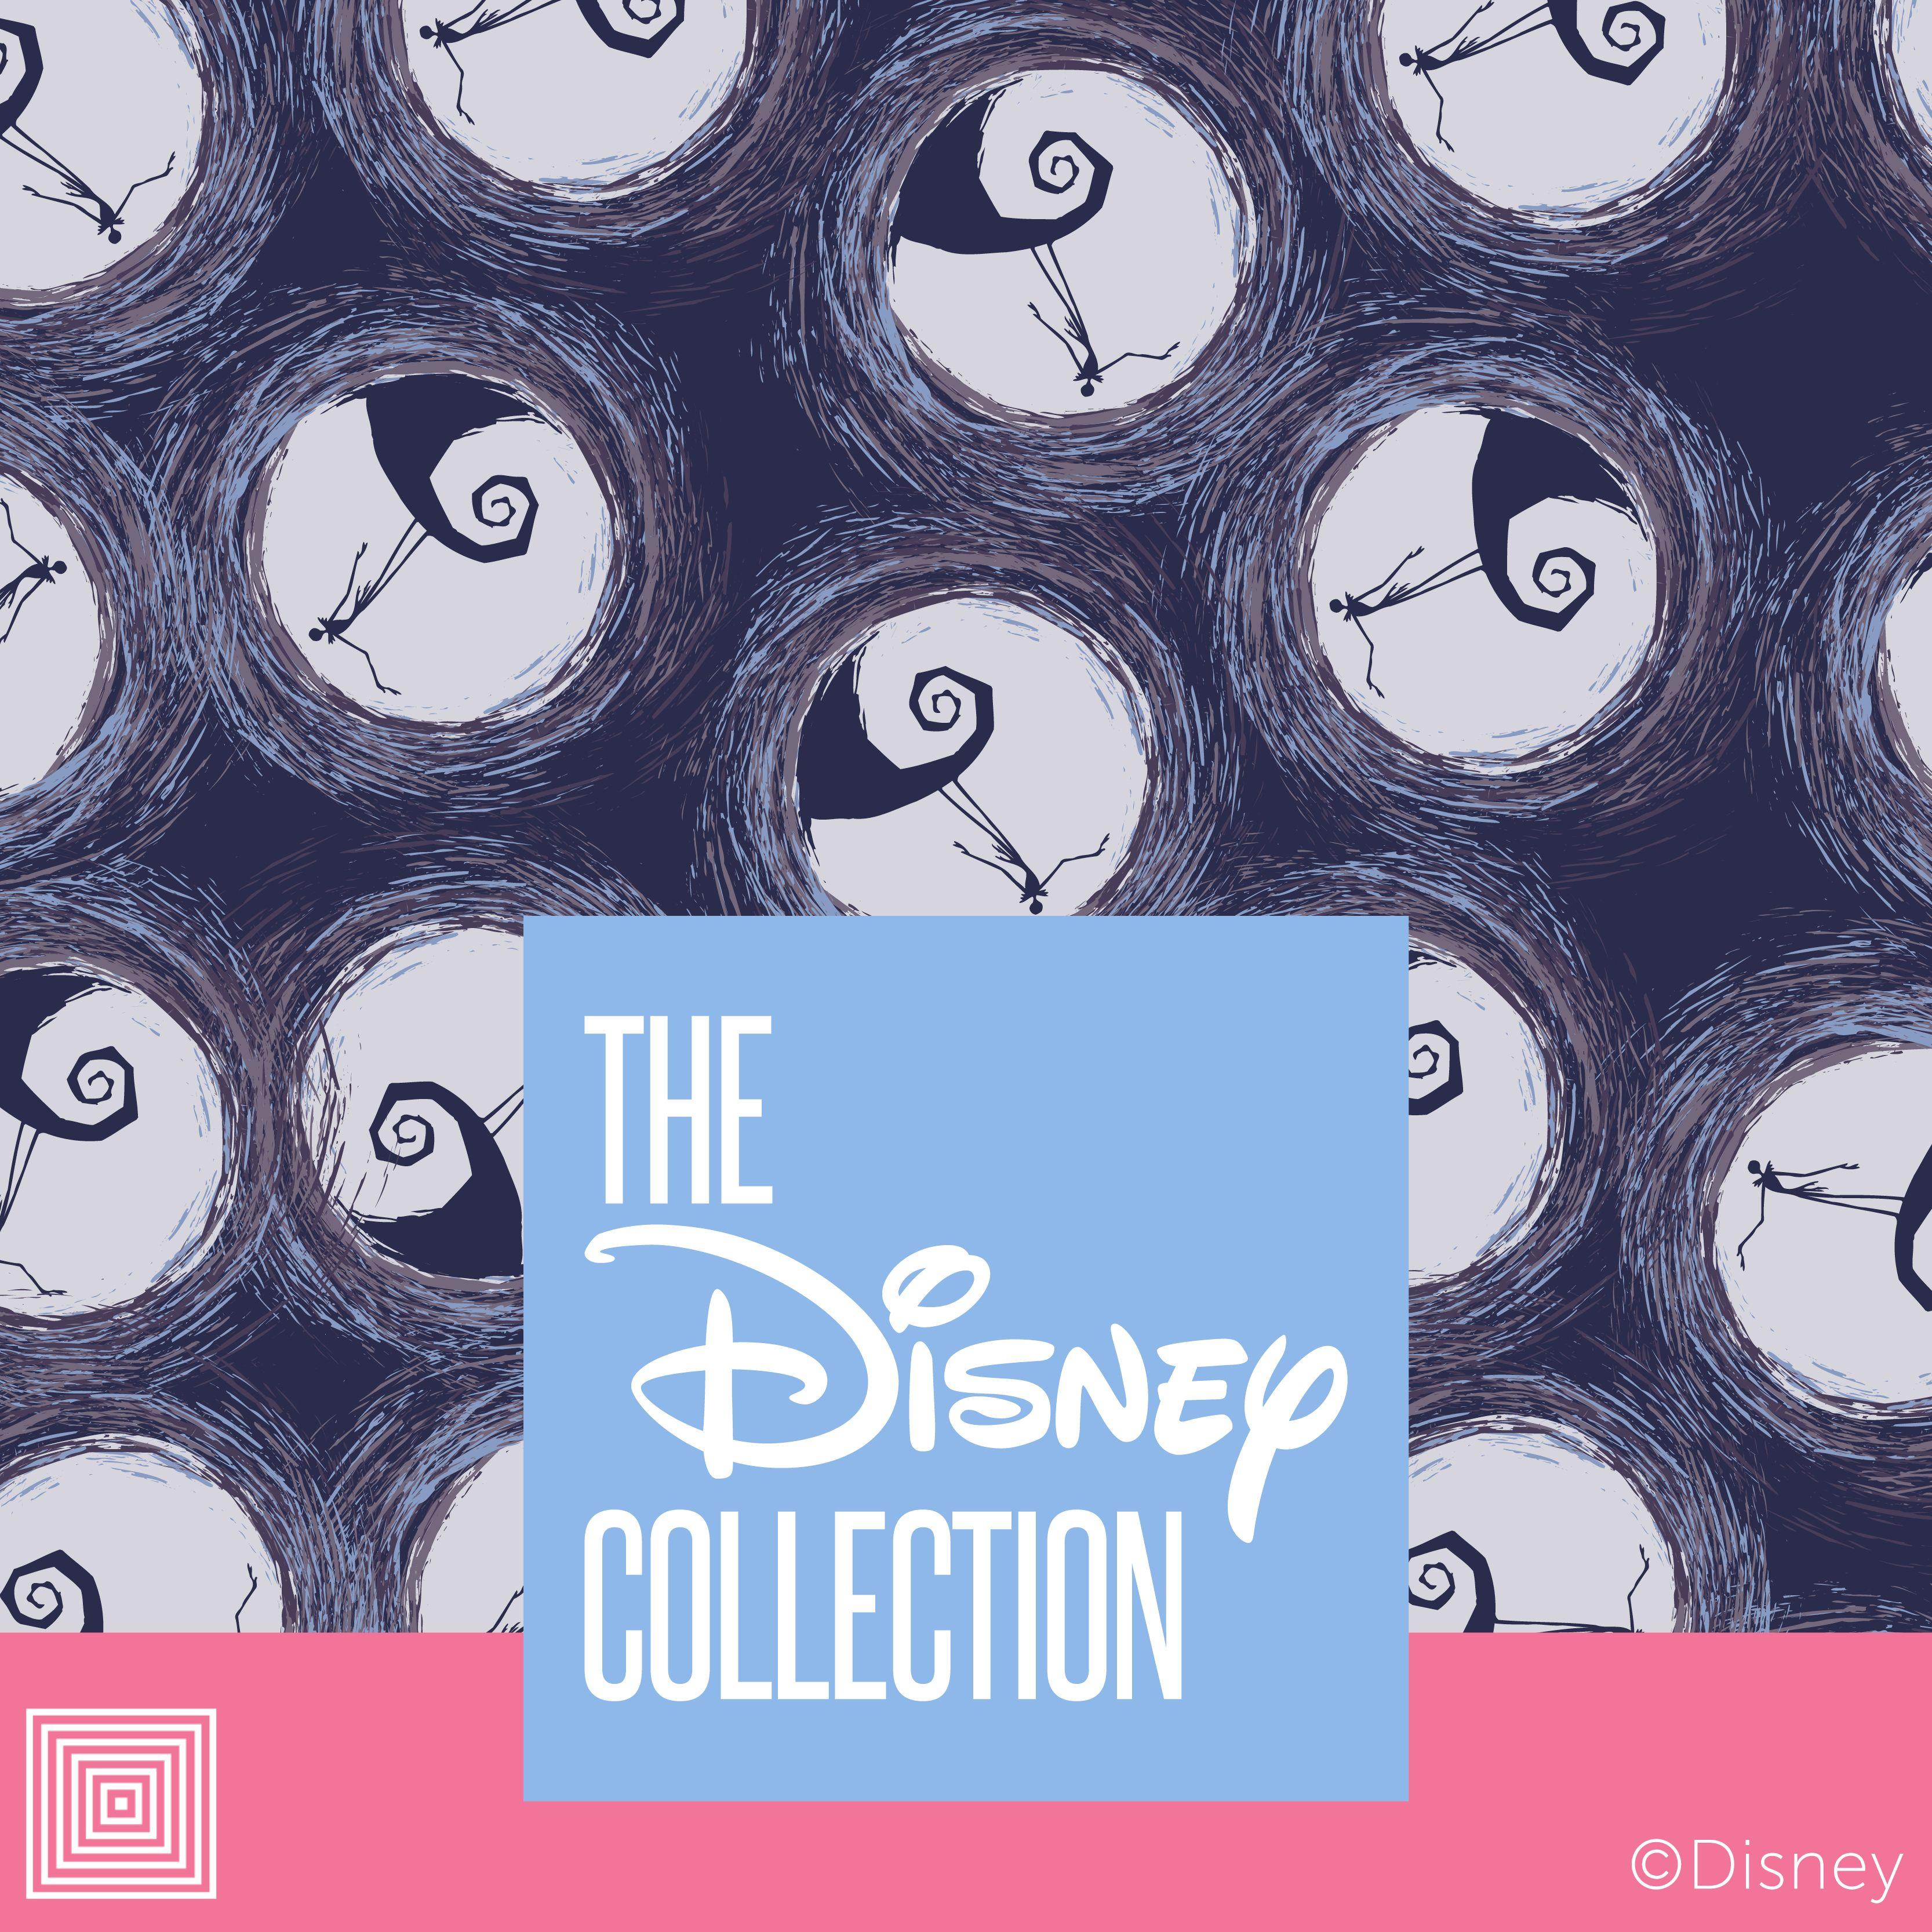 445ecf9813e520 Shop for LuLaRoe Collection for Disney Villain & Nightmare Before Christmas  Collection